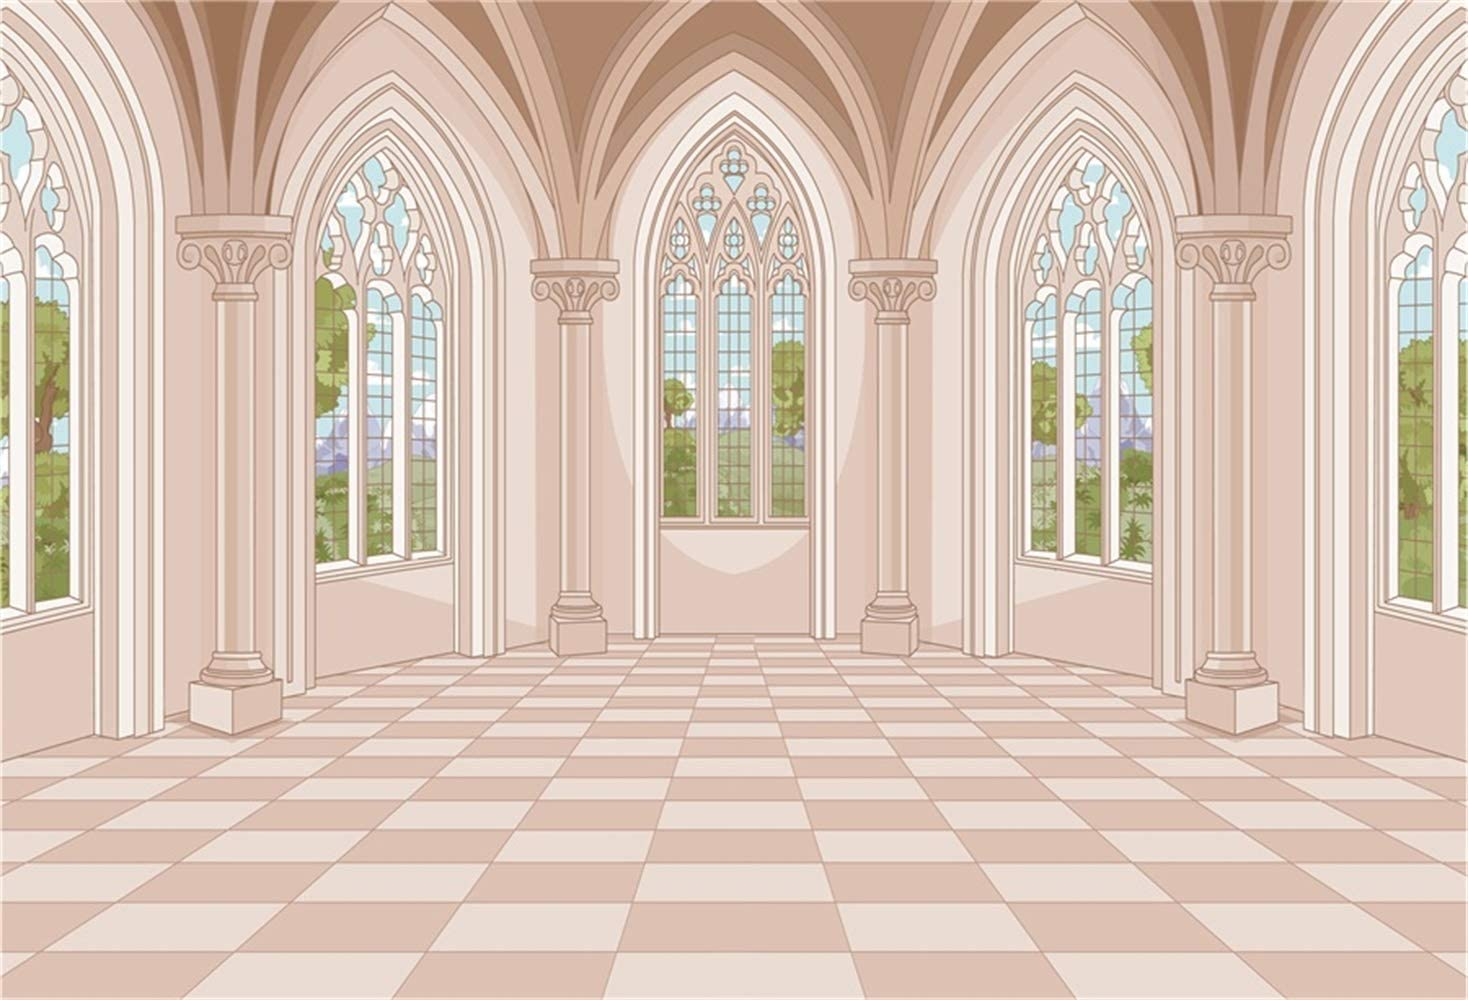 Laeacco 8x6.5ft Cartoon Classical Max 55% Ranking TOP4 OFF Palace Interior Vinyl European